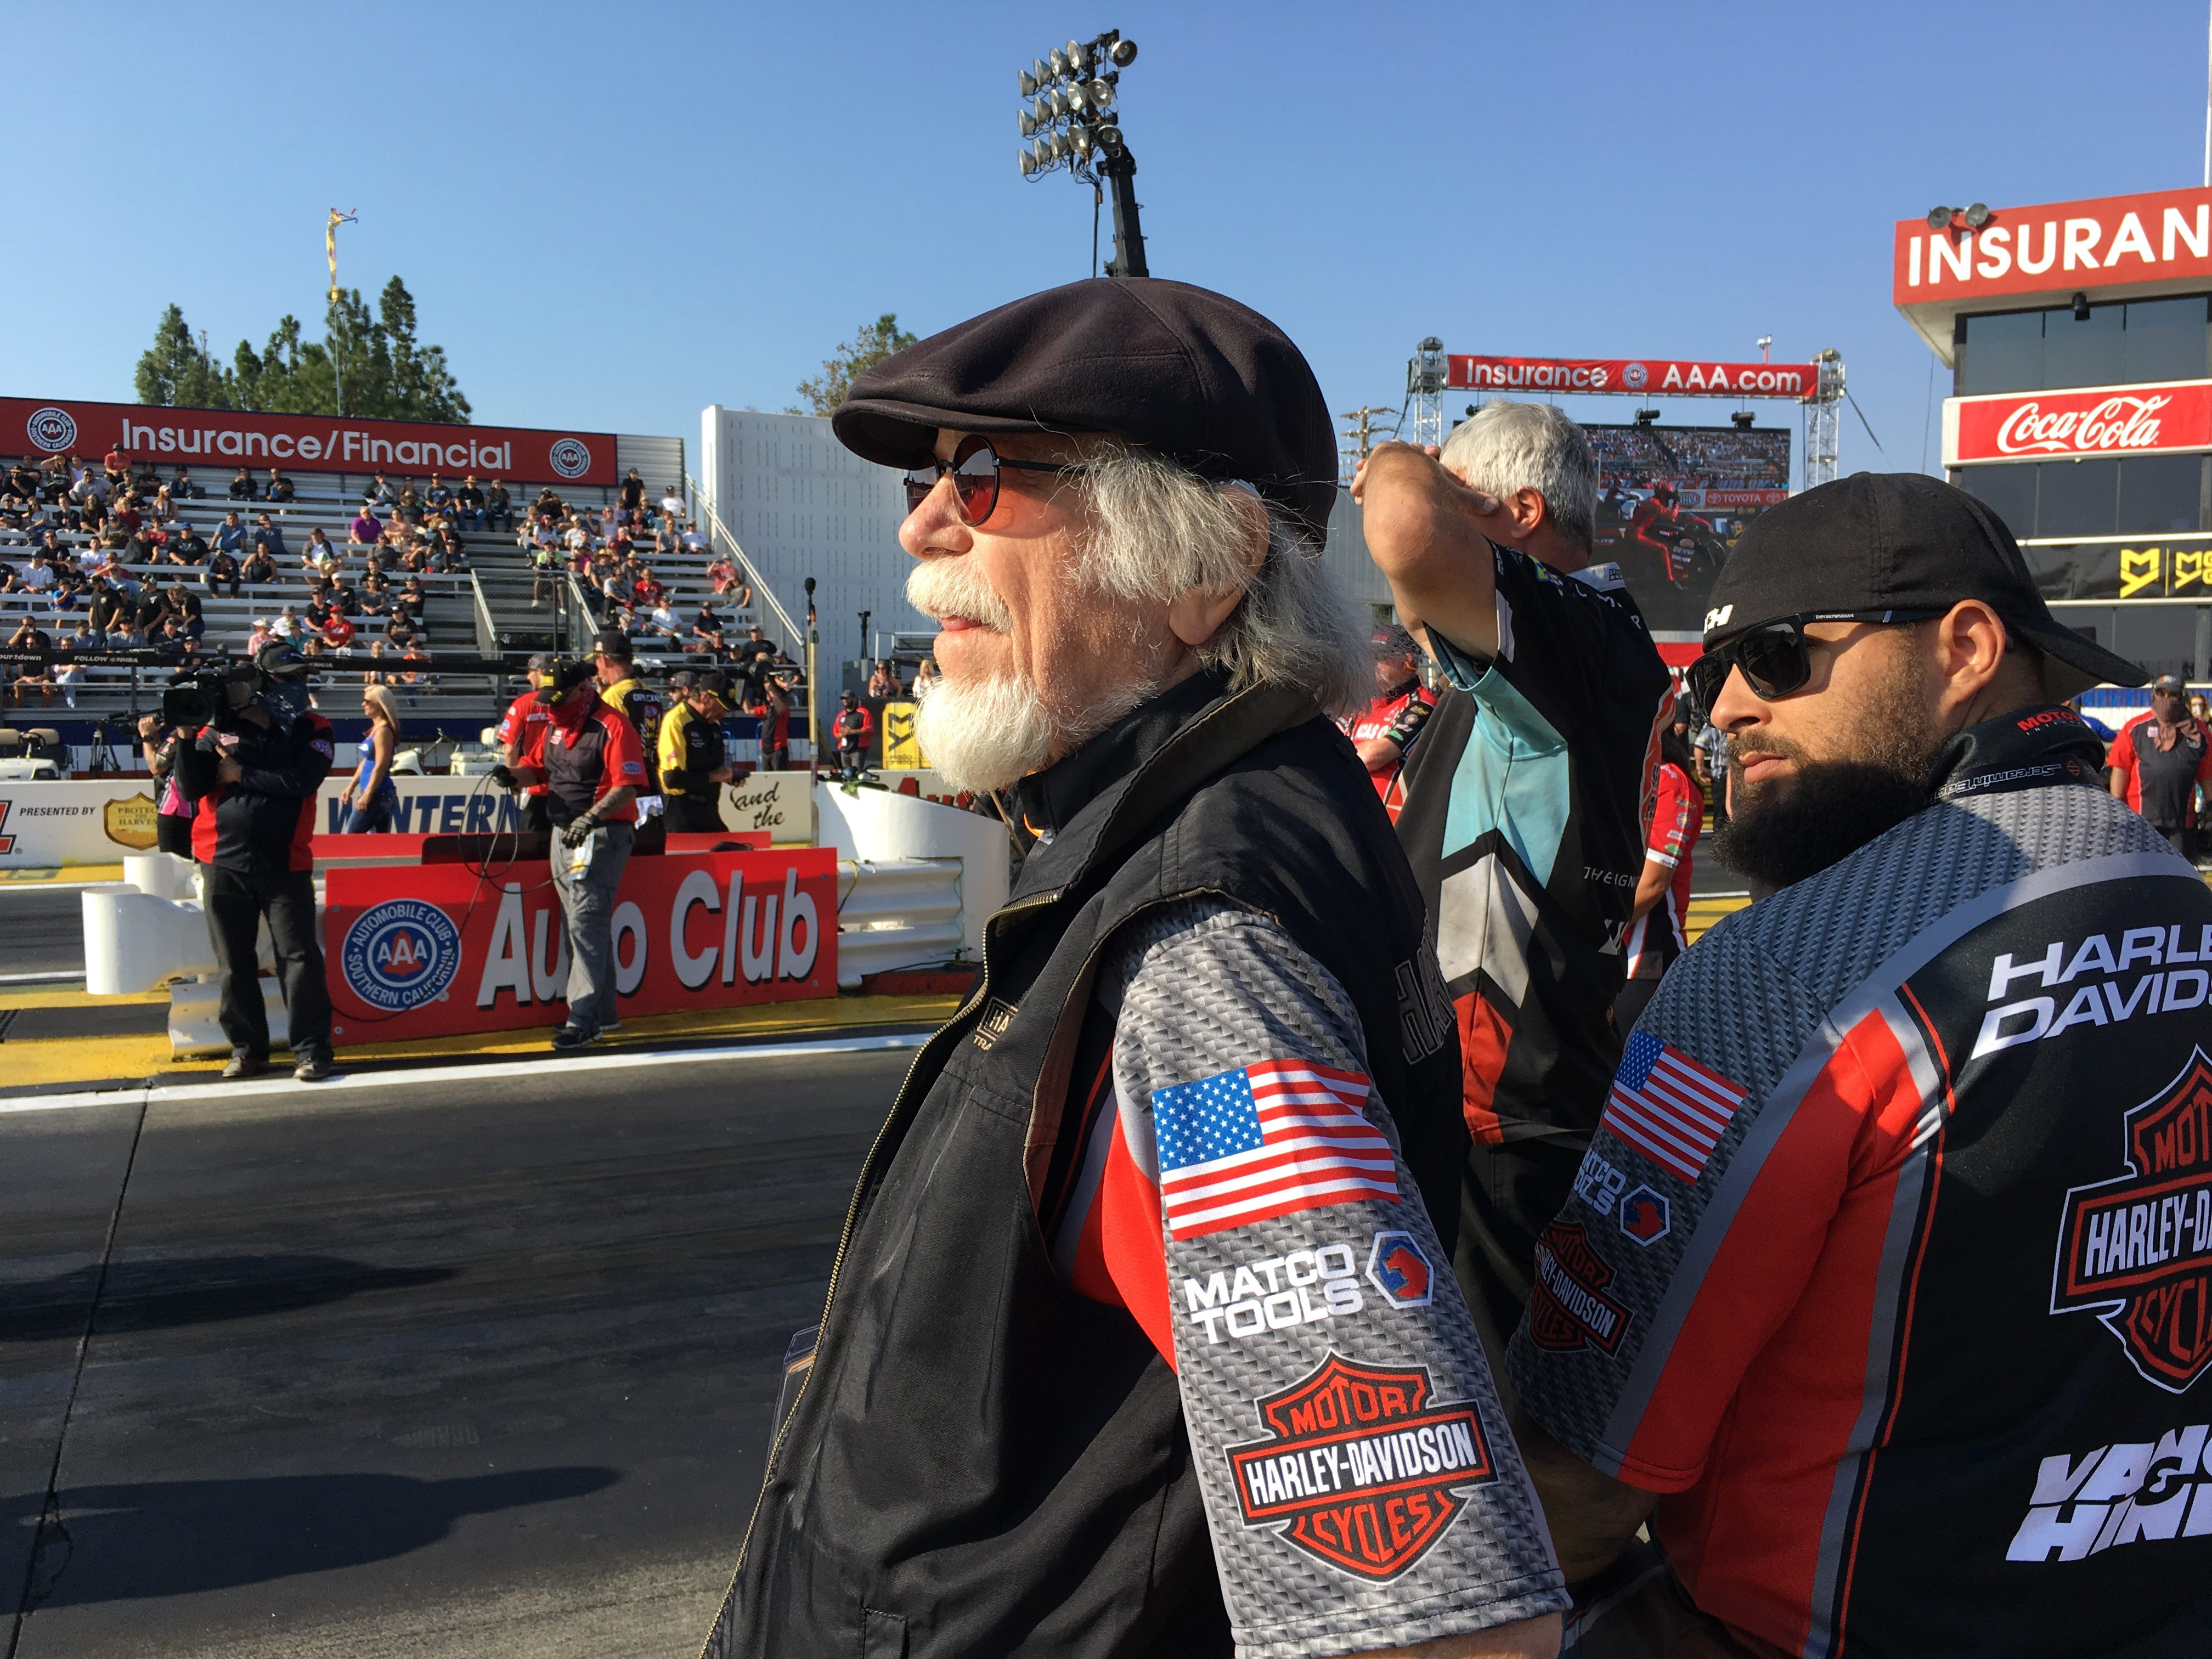 Willie G Davidson: NHRA World Finals Photo And Video Coverage